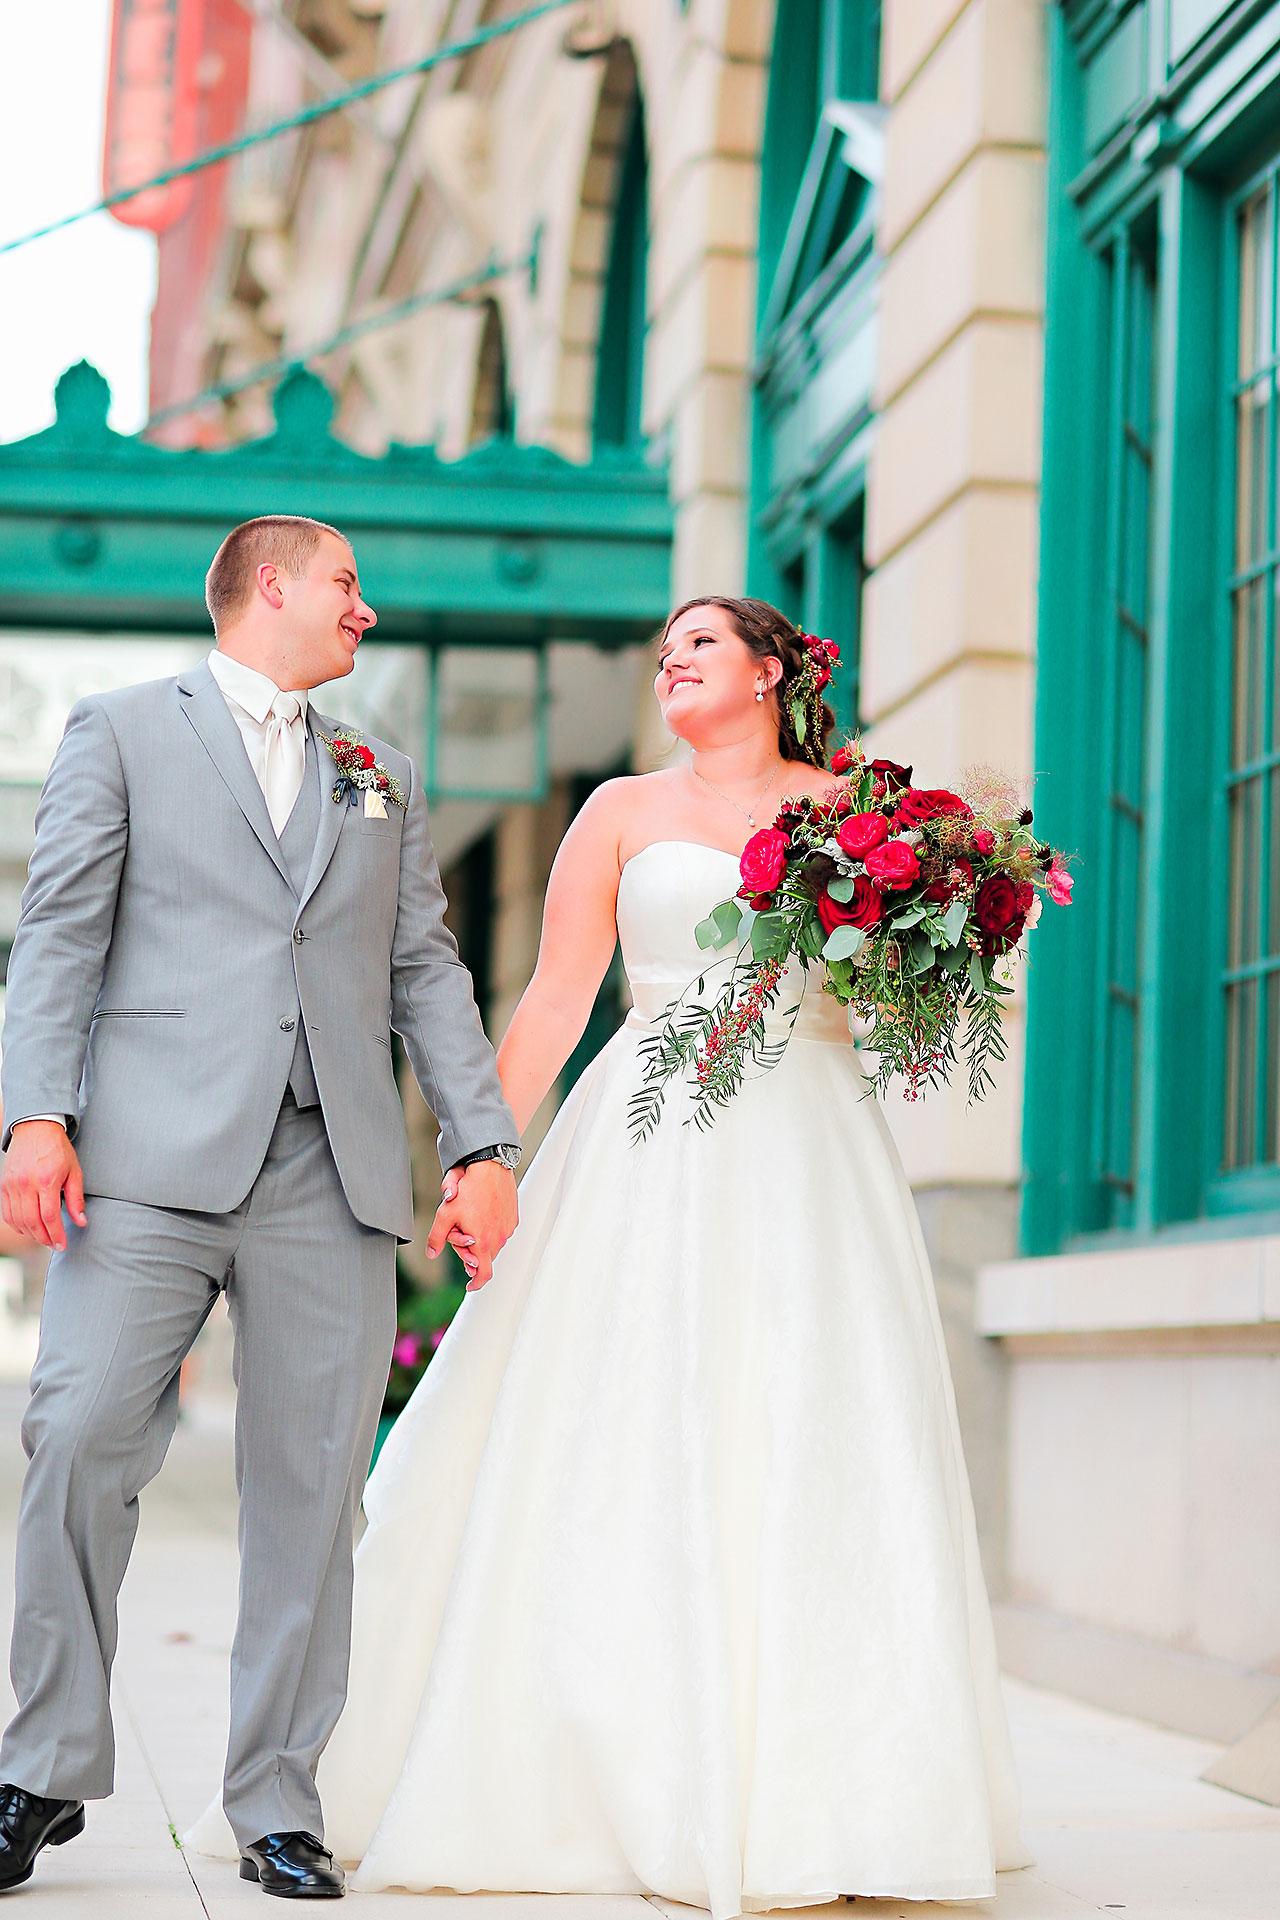 Diana Nick Crowne Plaza Indianapolis Wedding 186